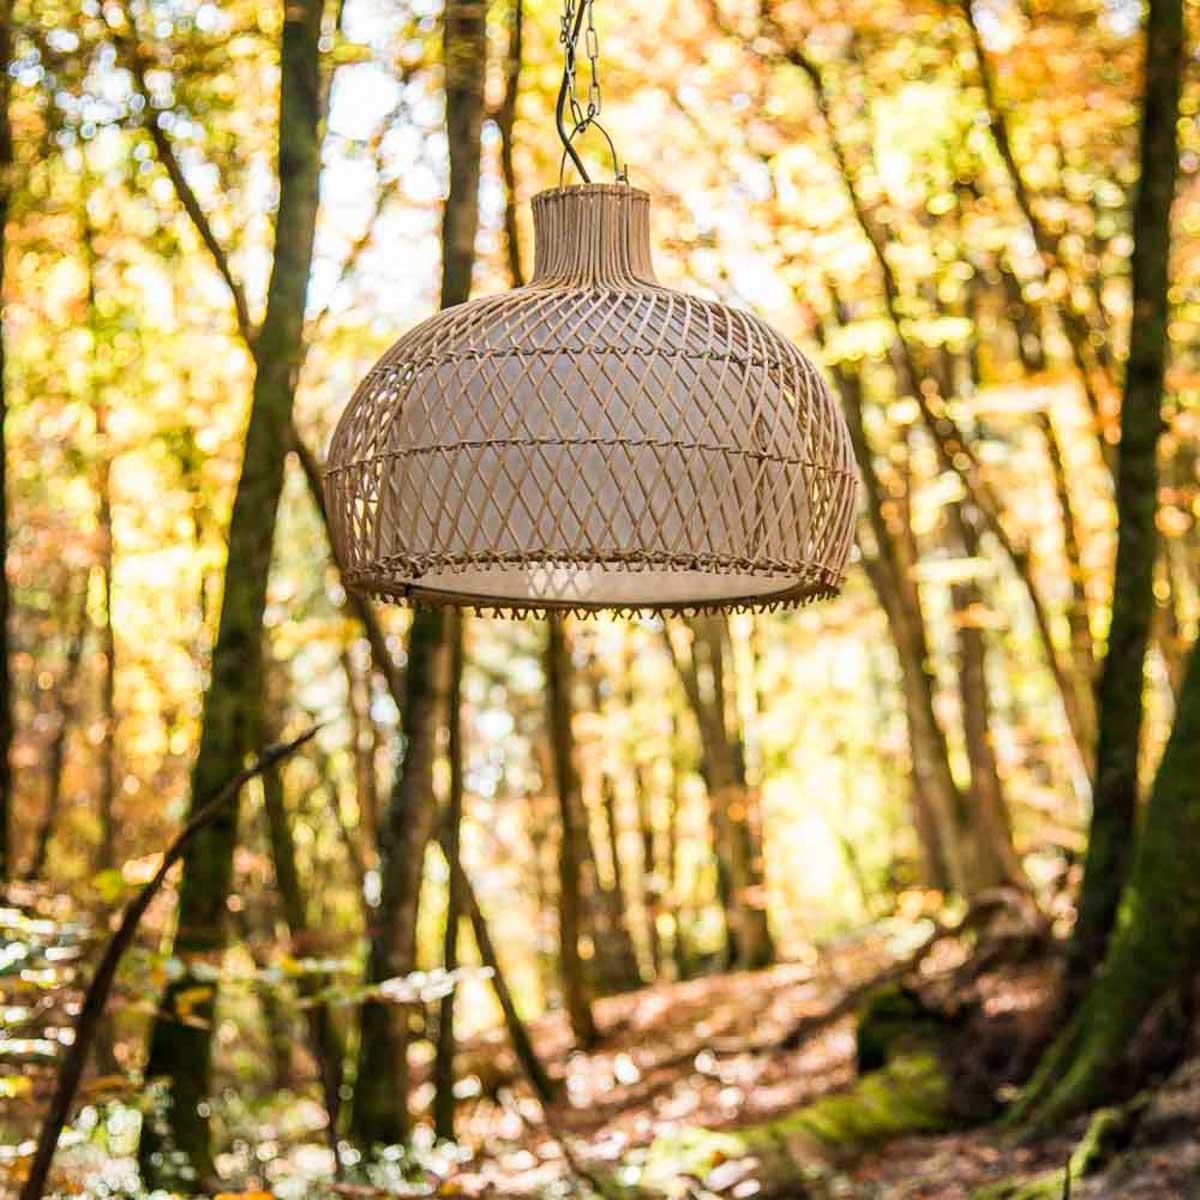 suspension luminaire lampe avec abat jour osier 44 cm. Black Bedroom Furniture Sets. Home Design Ideas